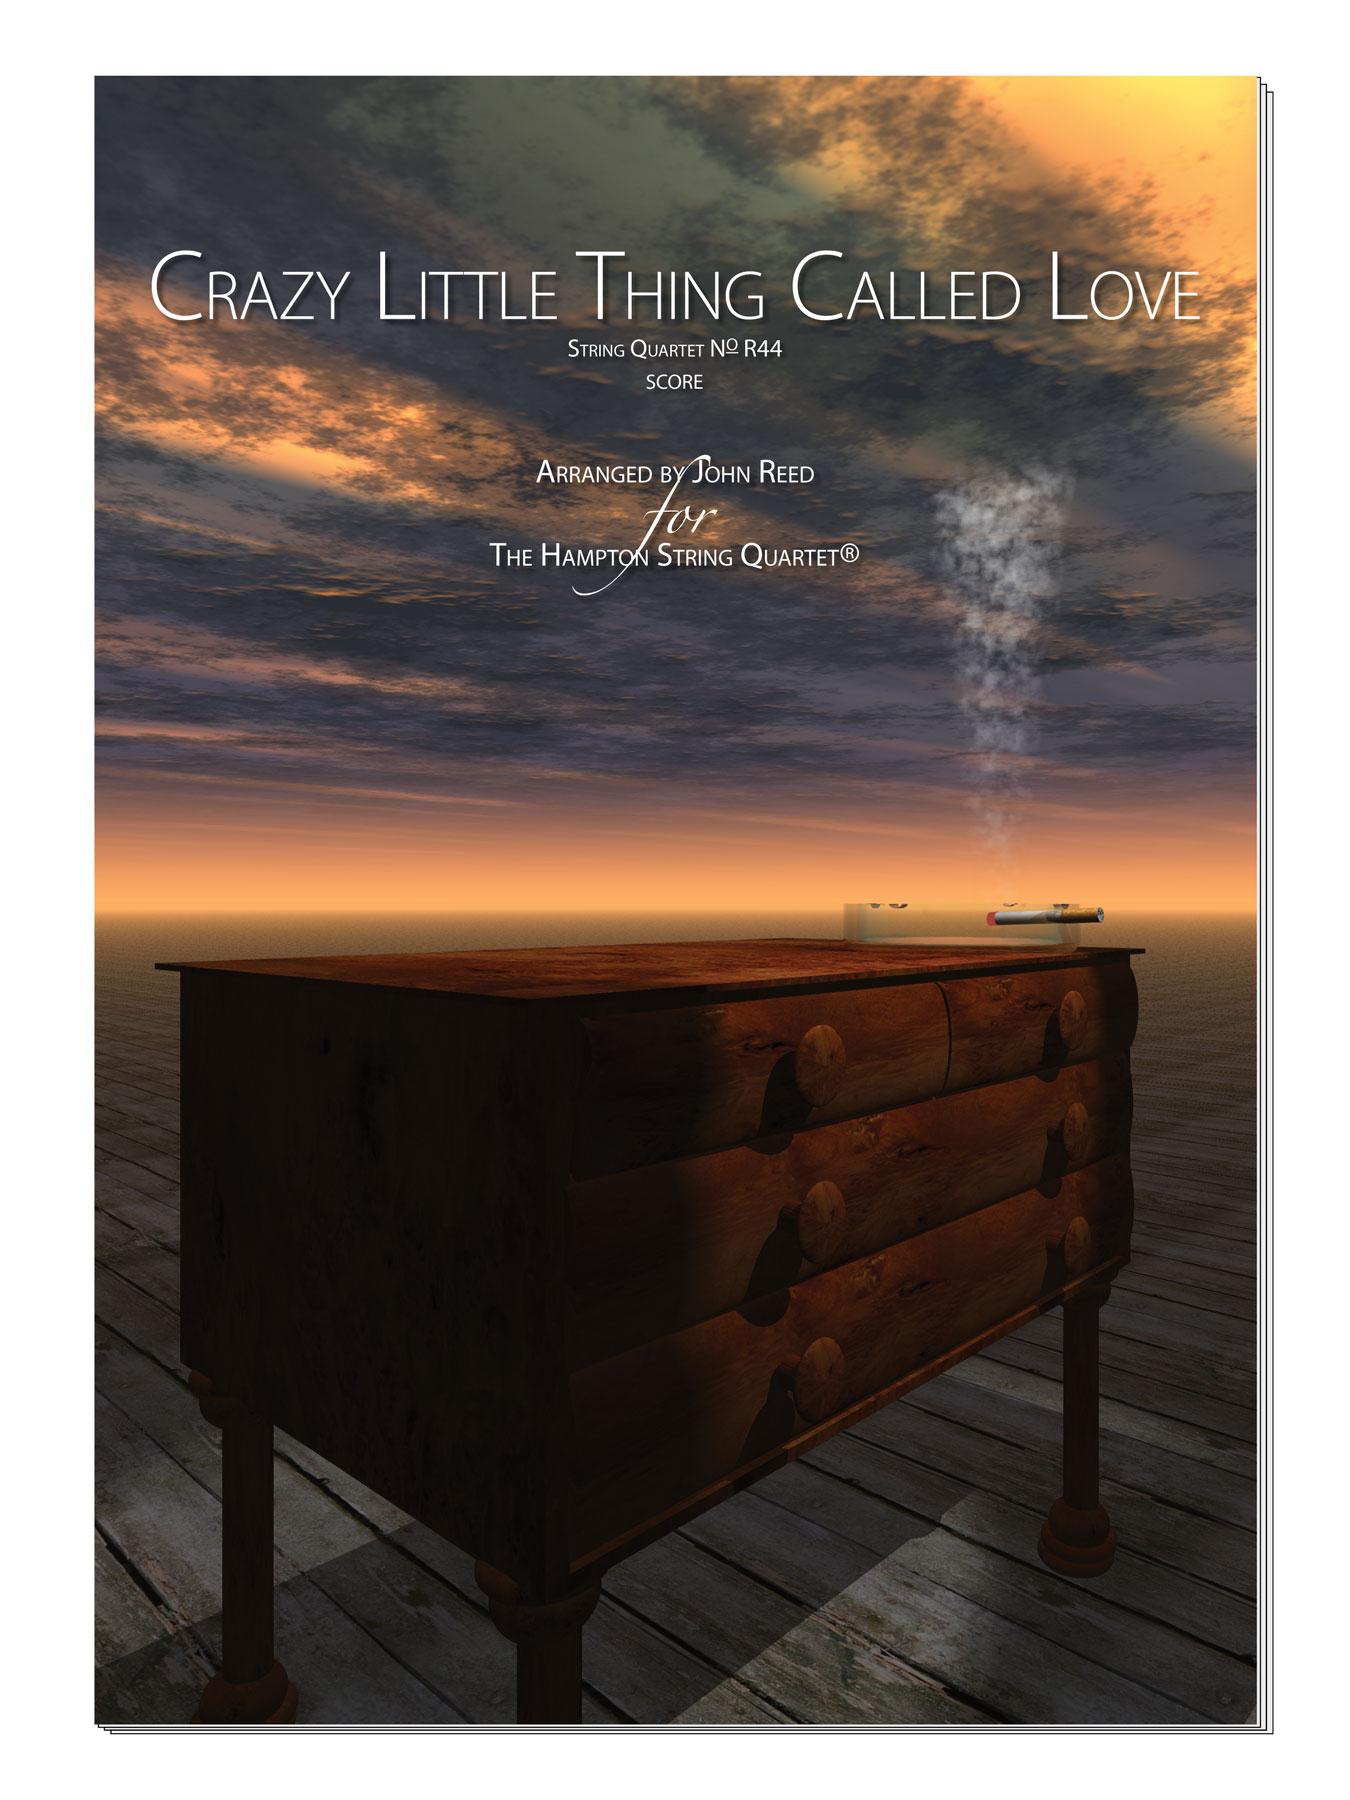 CrazyLittleThingCalledLove.jpg